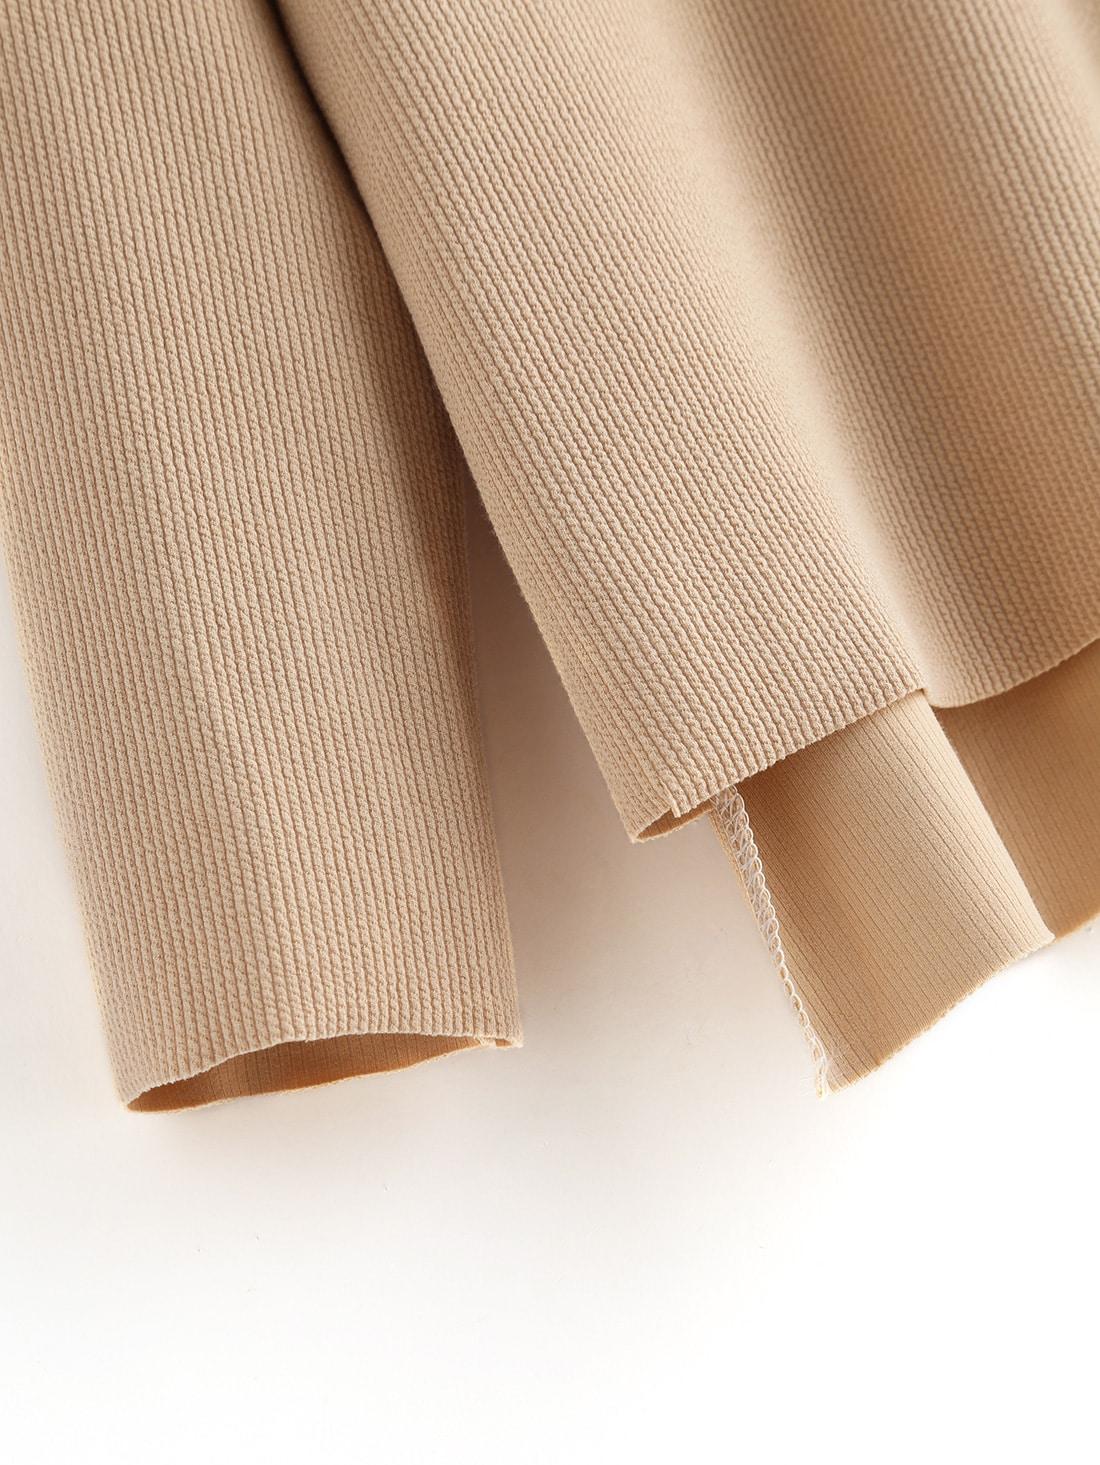 Pull trap ze couleur unis beige french shein sheinside - Couleur beige en anglais ...